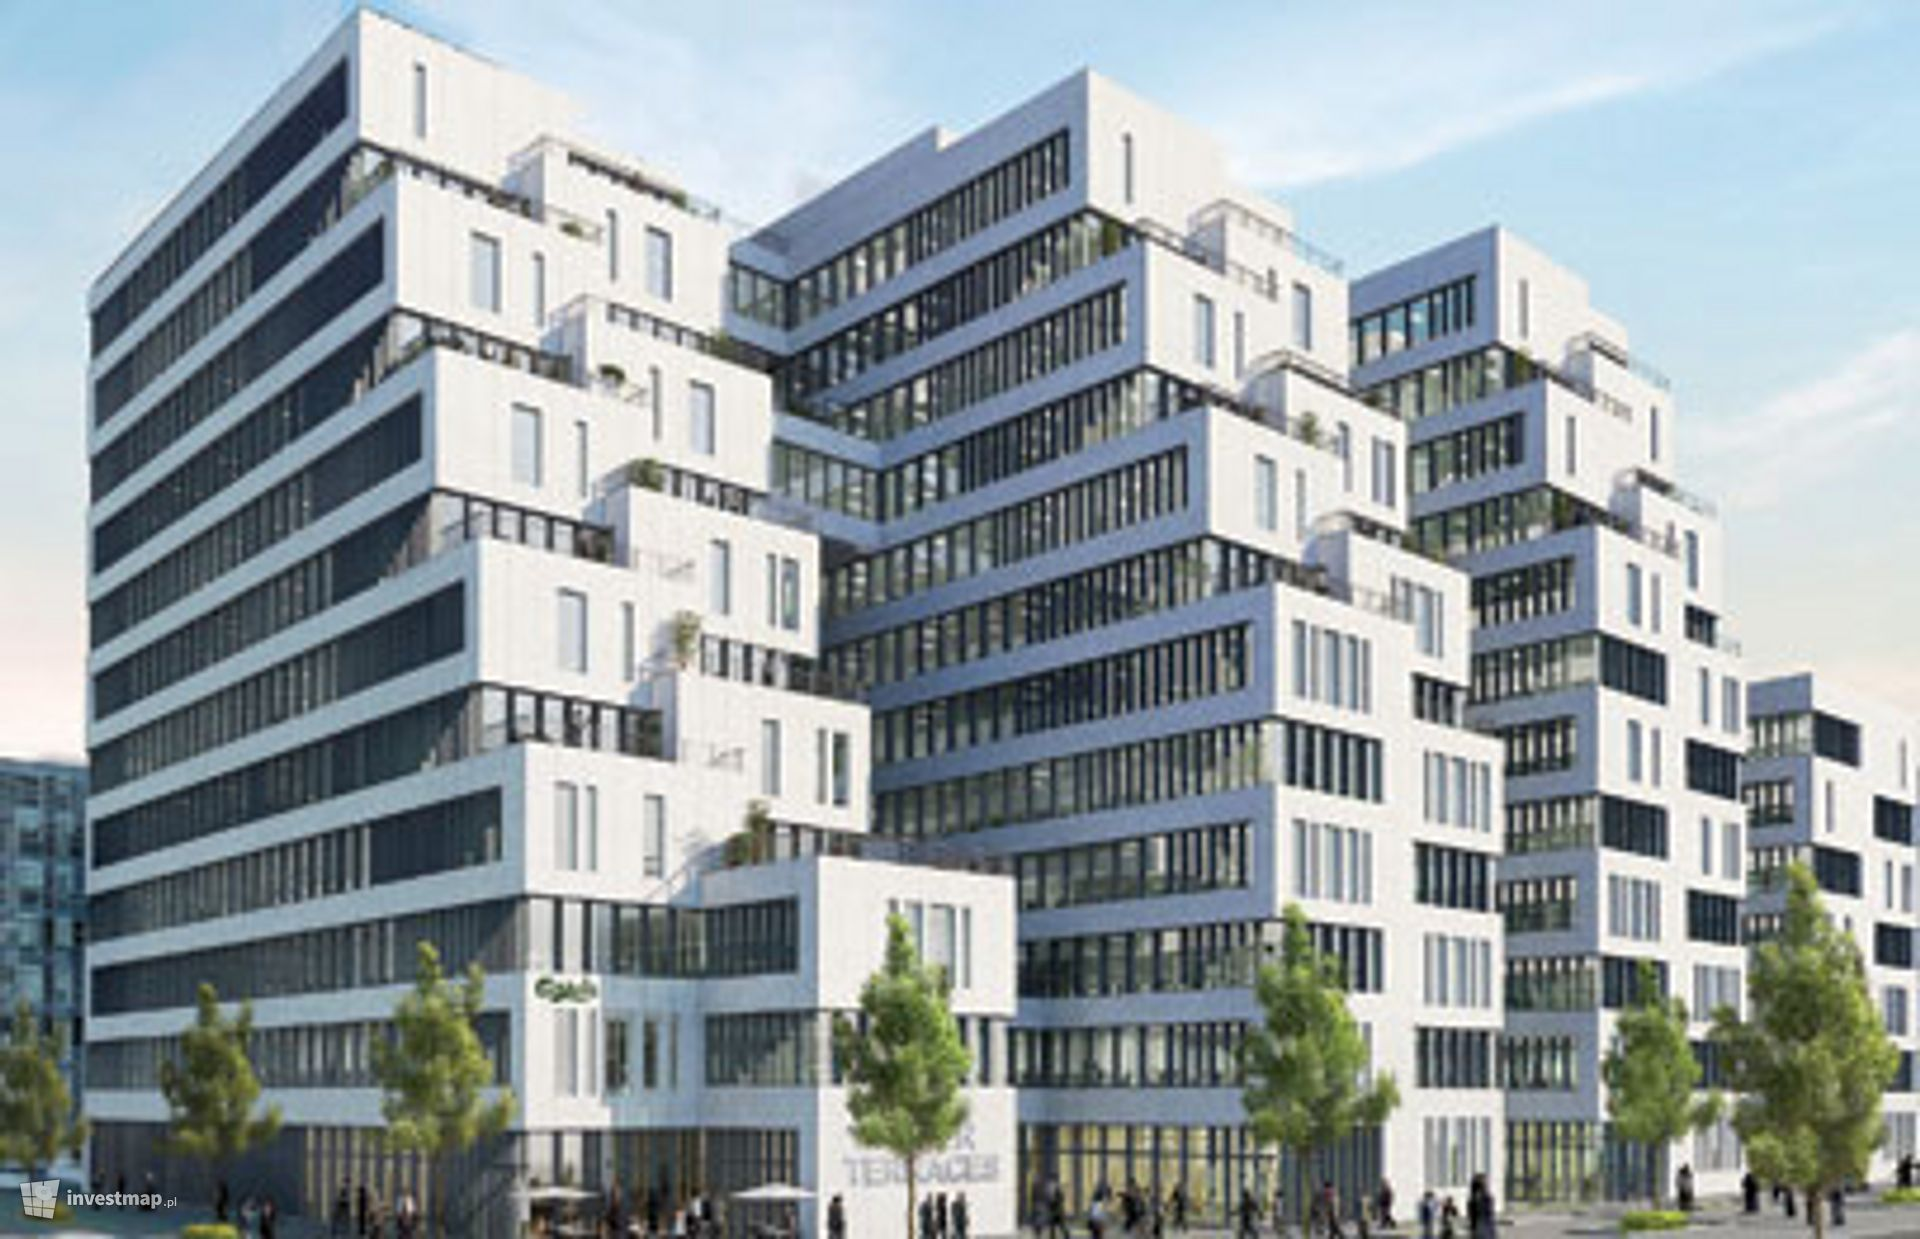 Biurowce Tower Terraces